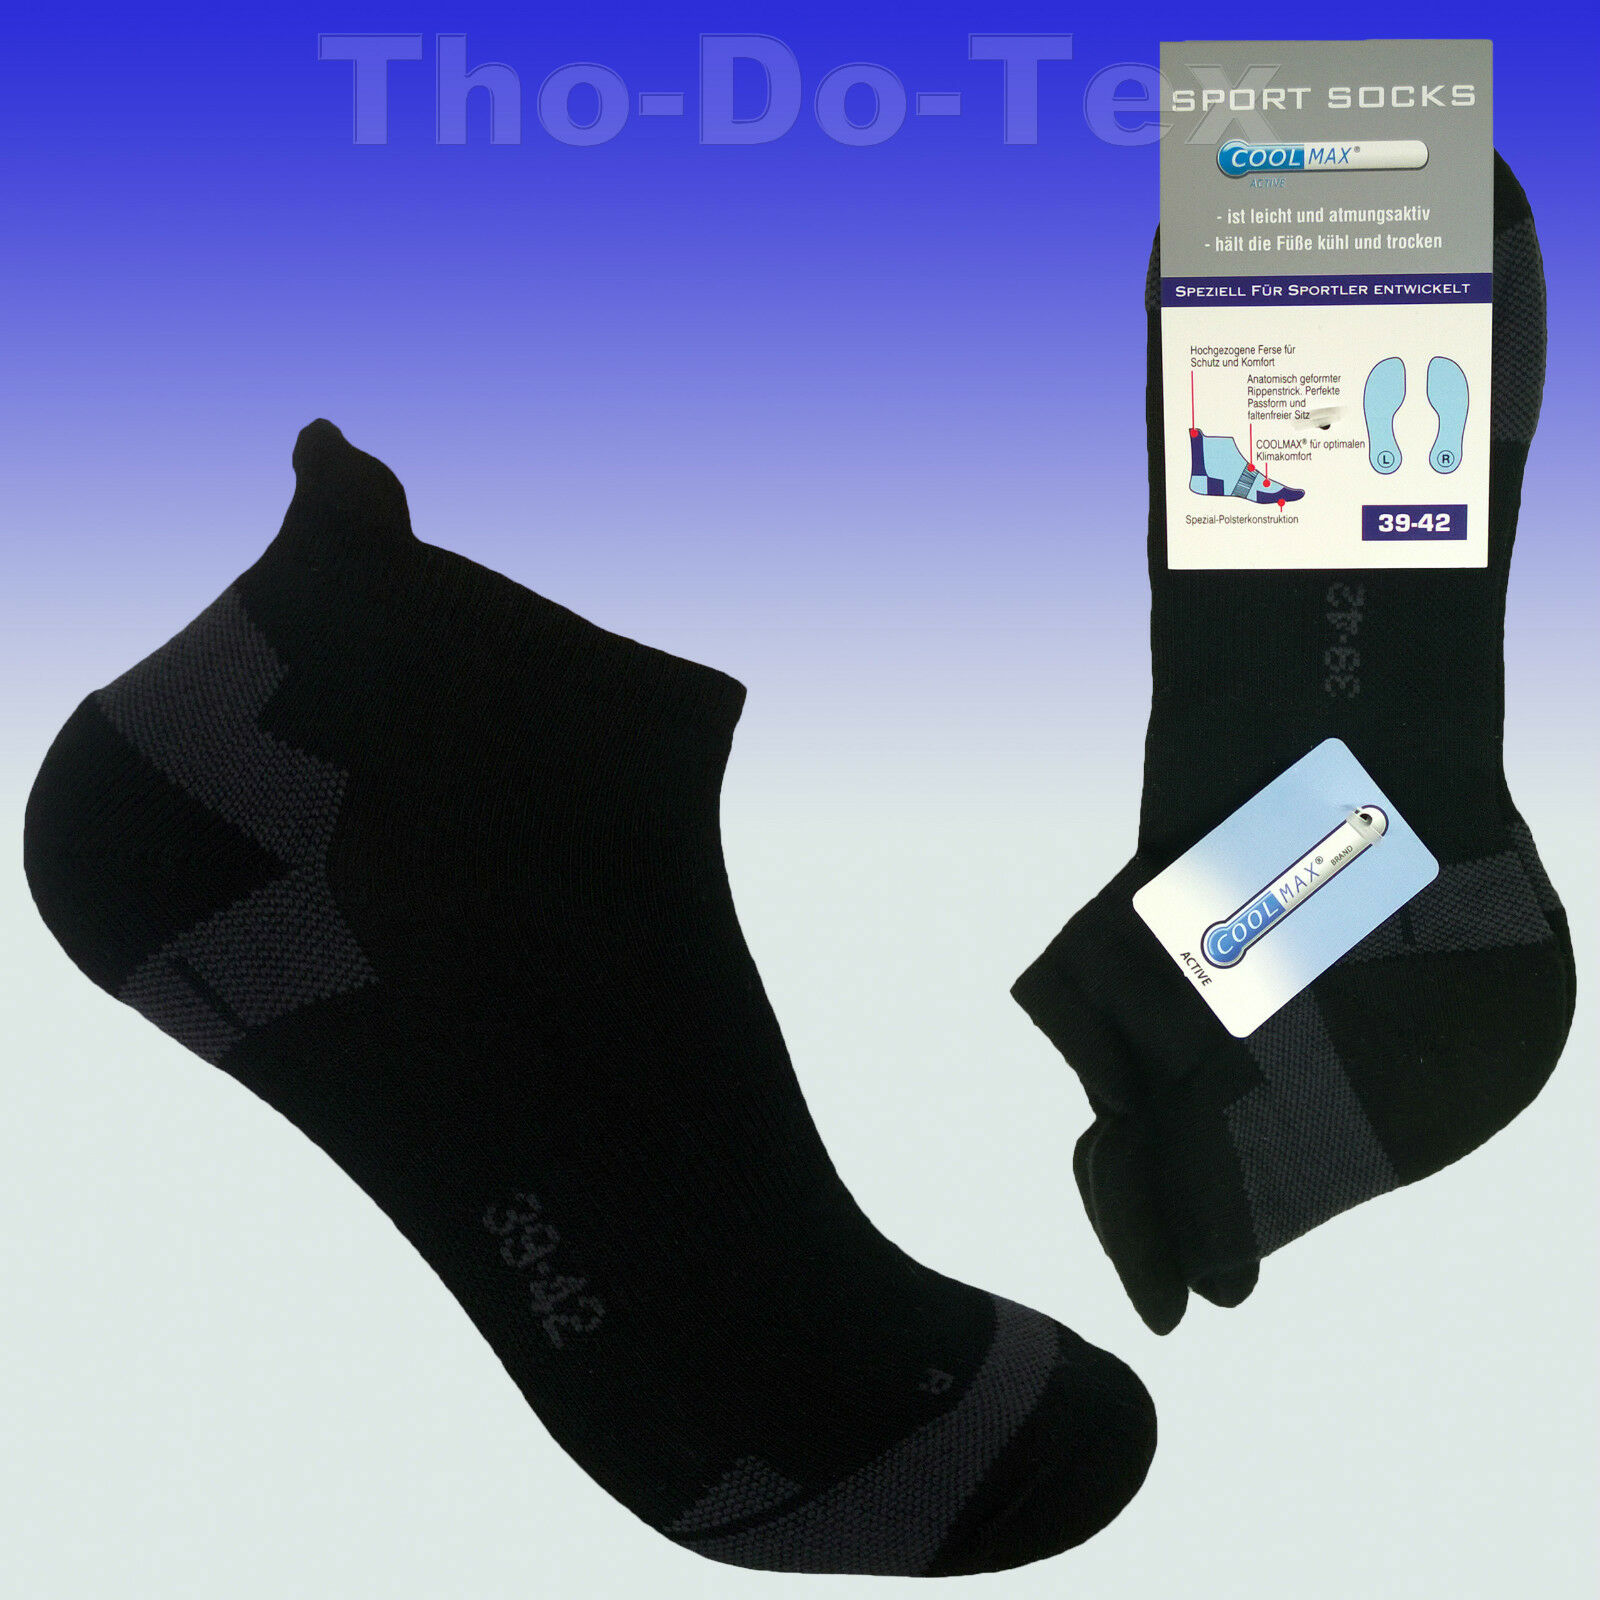 1970d59fd80a88 Details zu COOLMAX ® Sneaker Socken Sportsocken, Funktionssocken, Spitze  gekettelt, schwarz